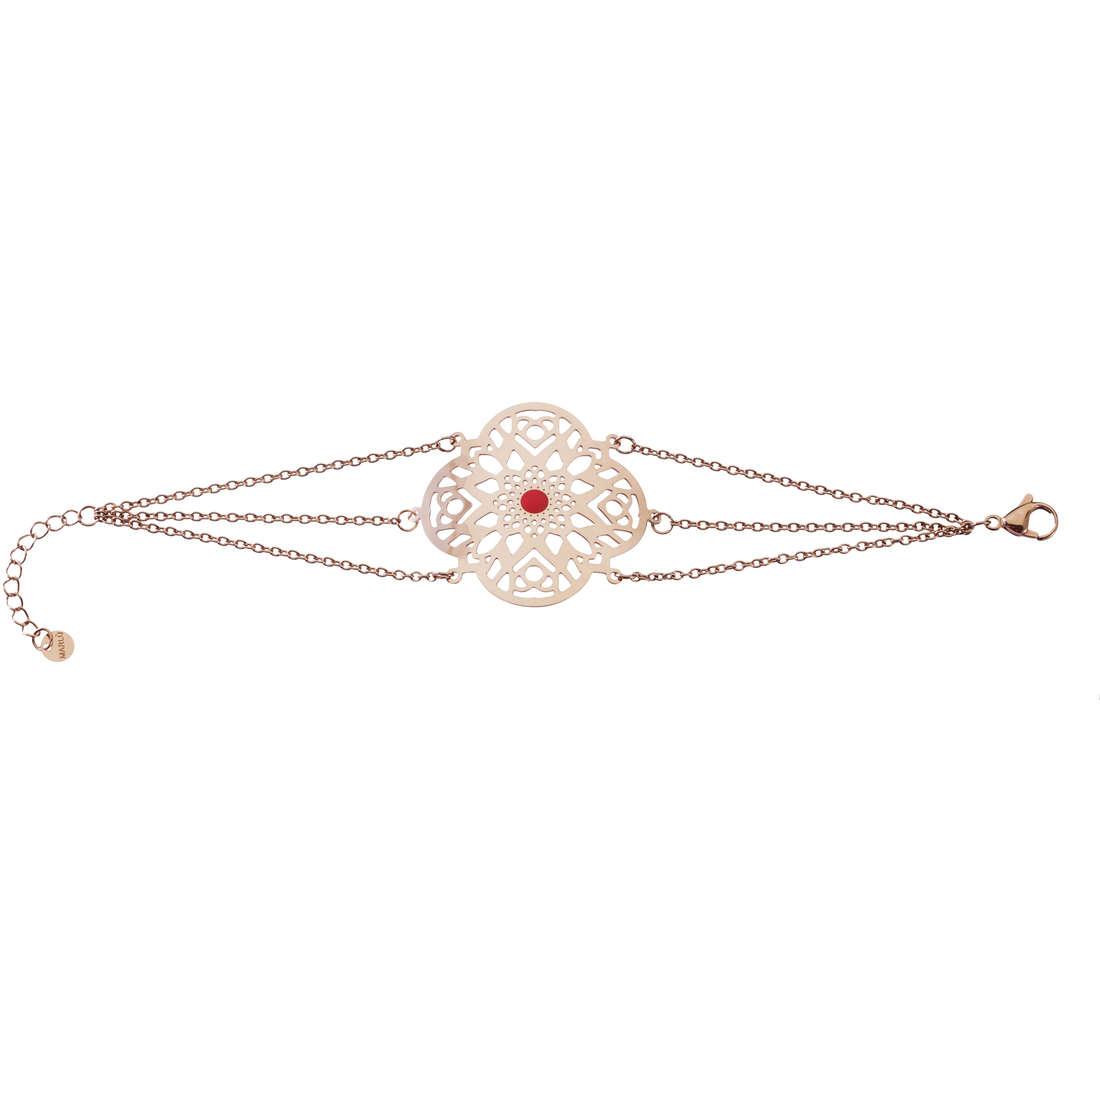 bracelet woman jewellery Marlù Woman Chic 2BR0035R